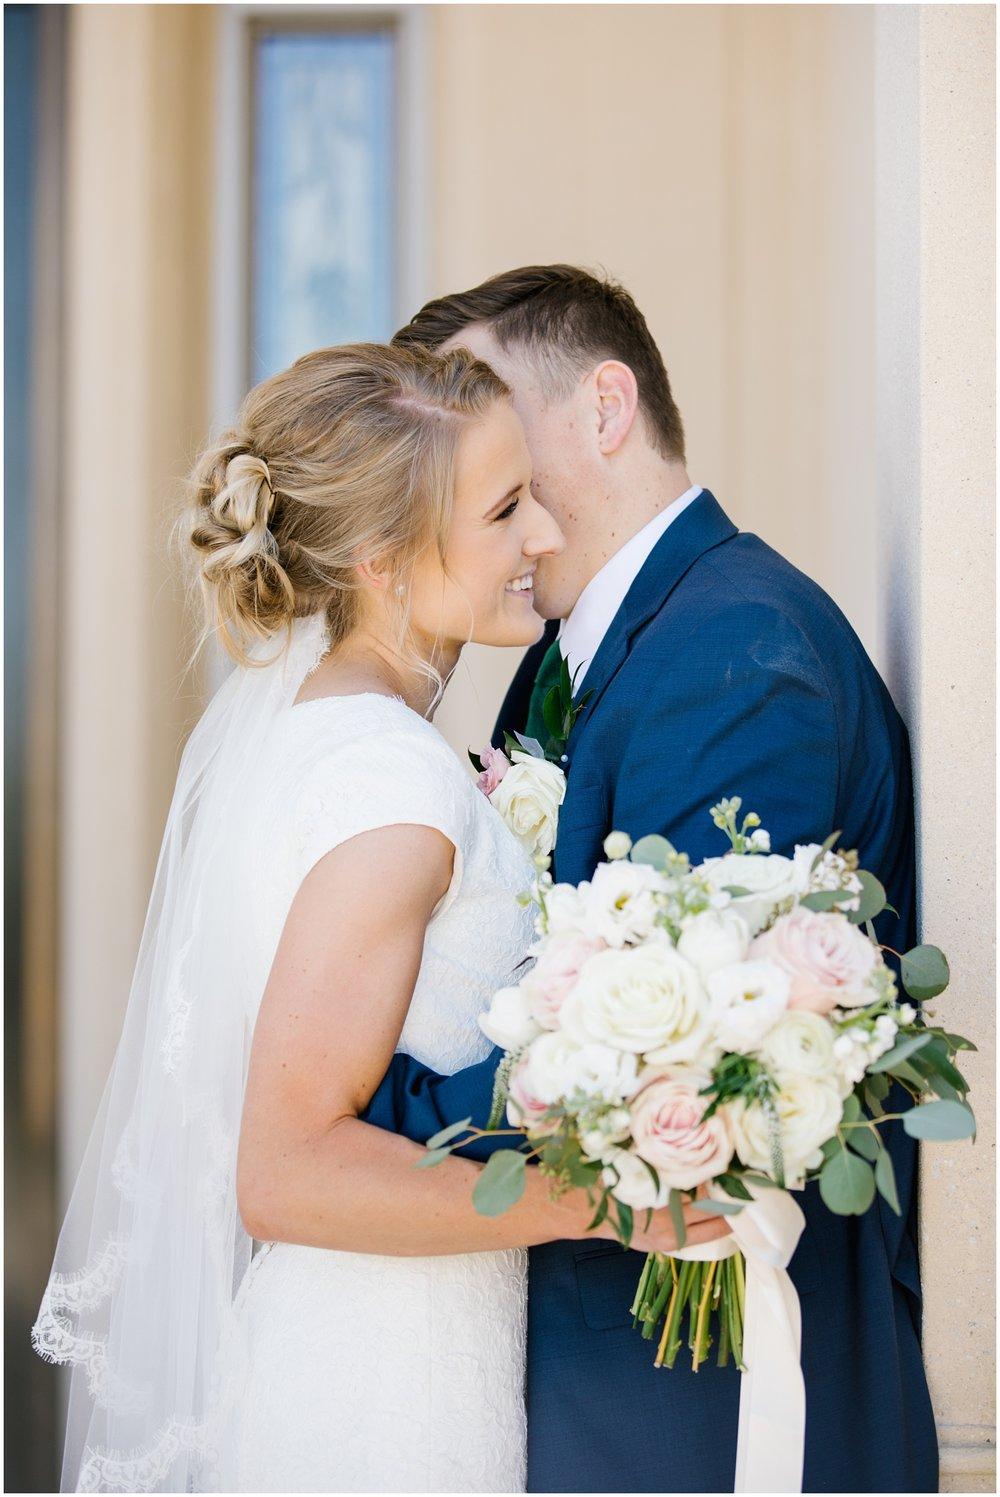 TA-Wedding-155_Lizzie-B-Imagery-Utah-Wedding-Photographer-Park-City-Salt-Lake-City-Thanksgiving-Point-Ashton-Gardens-Lehi-Utah.jpg